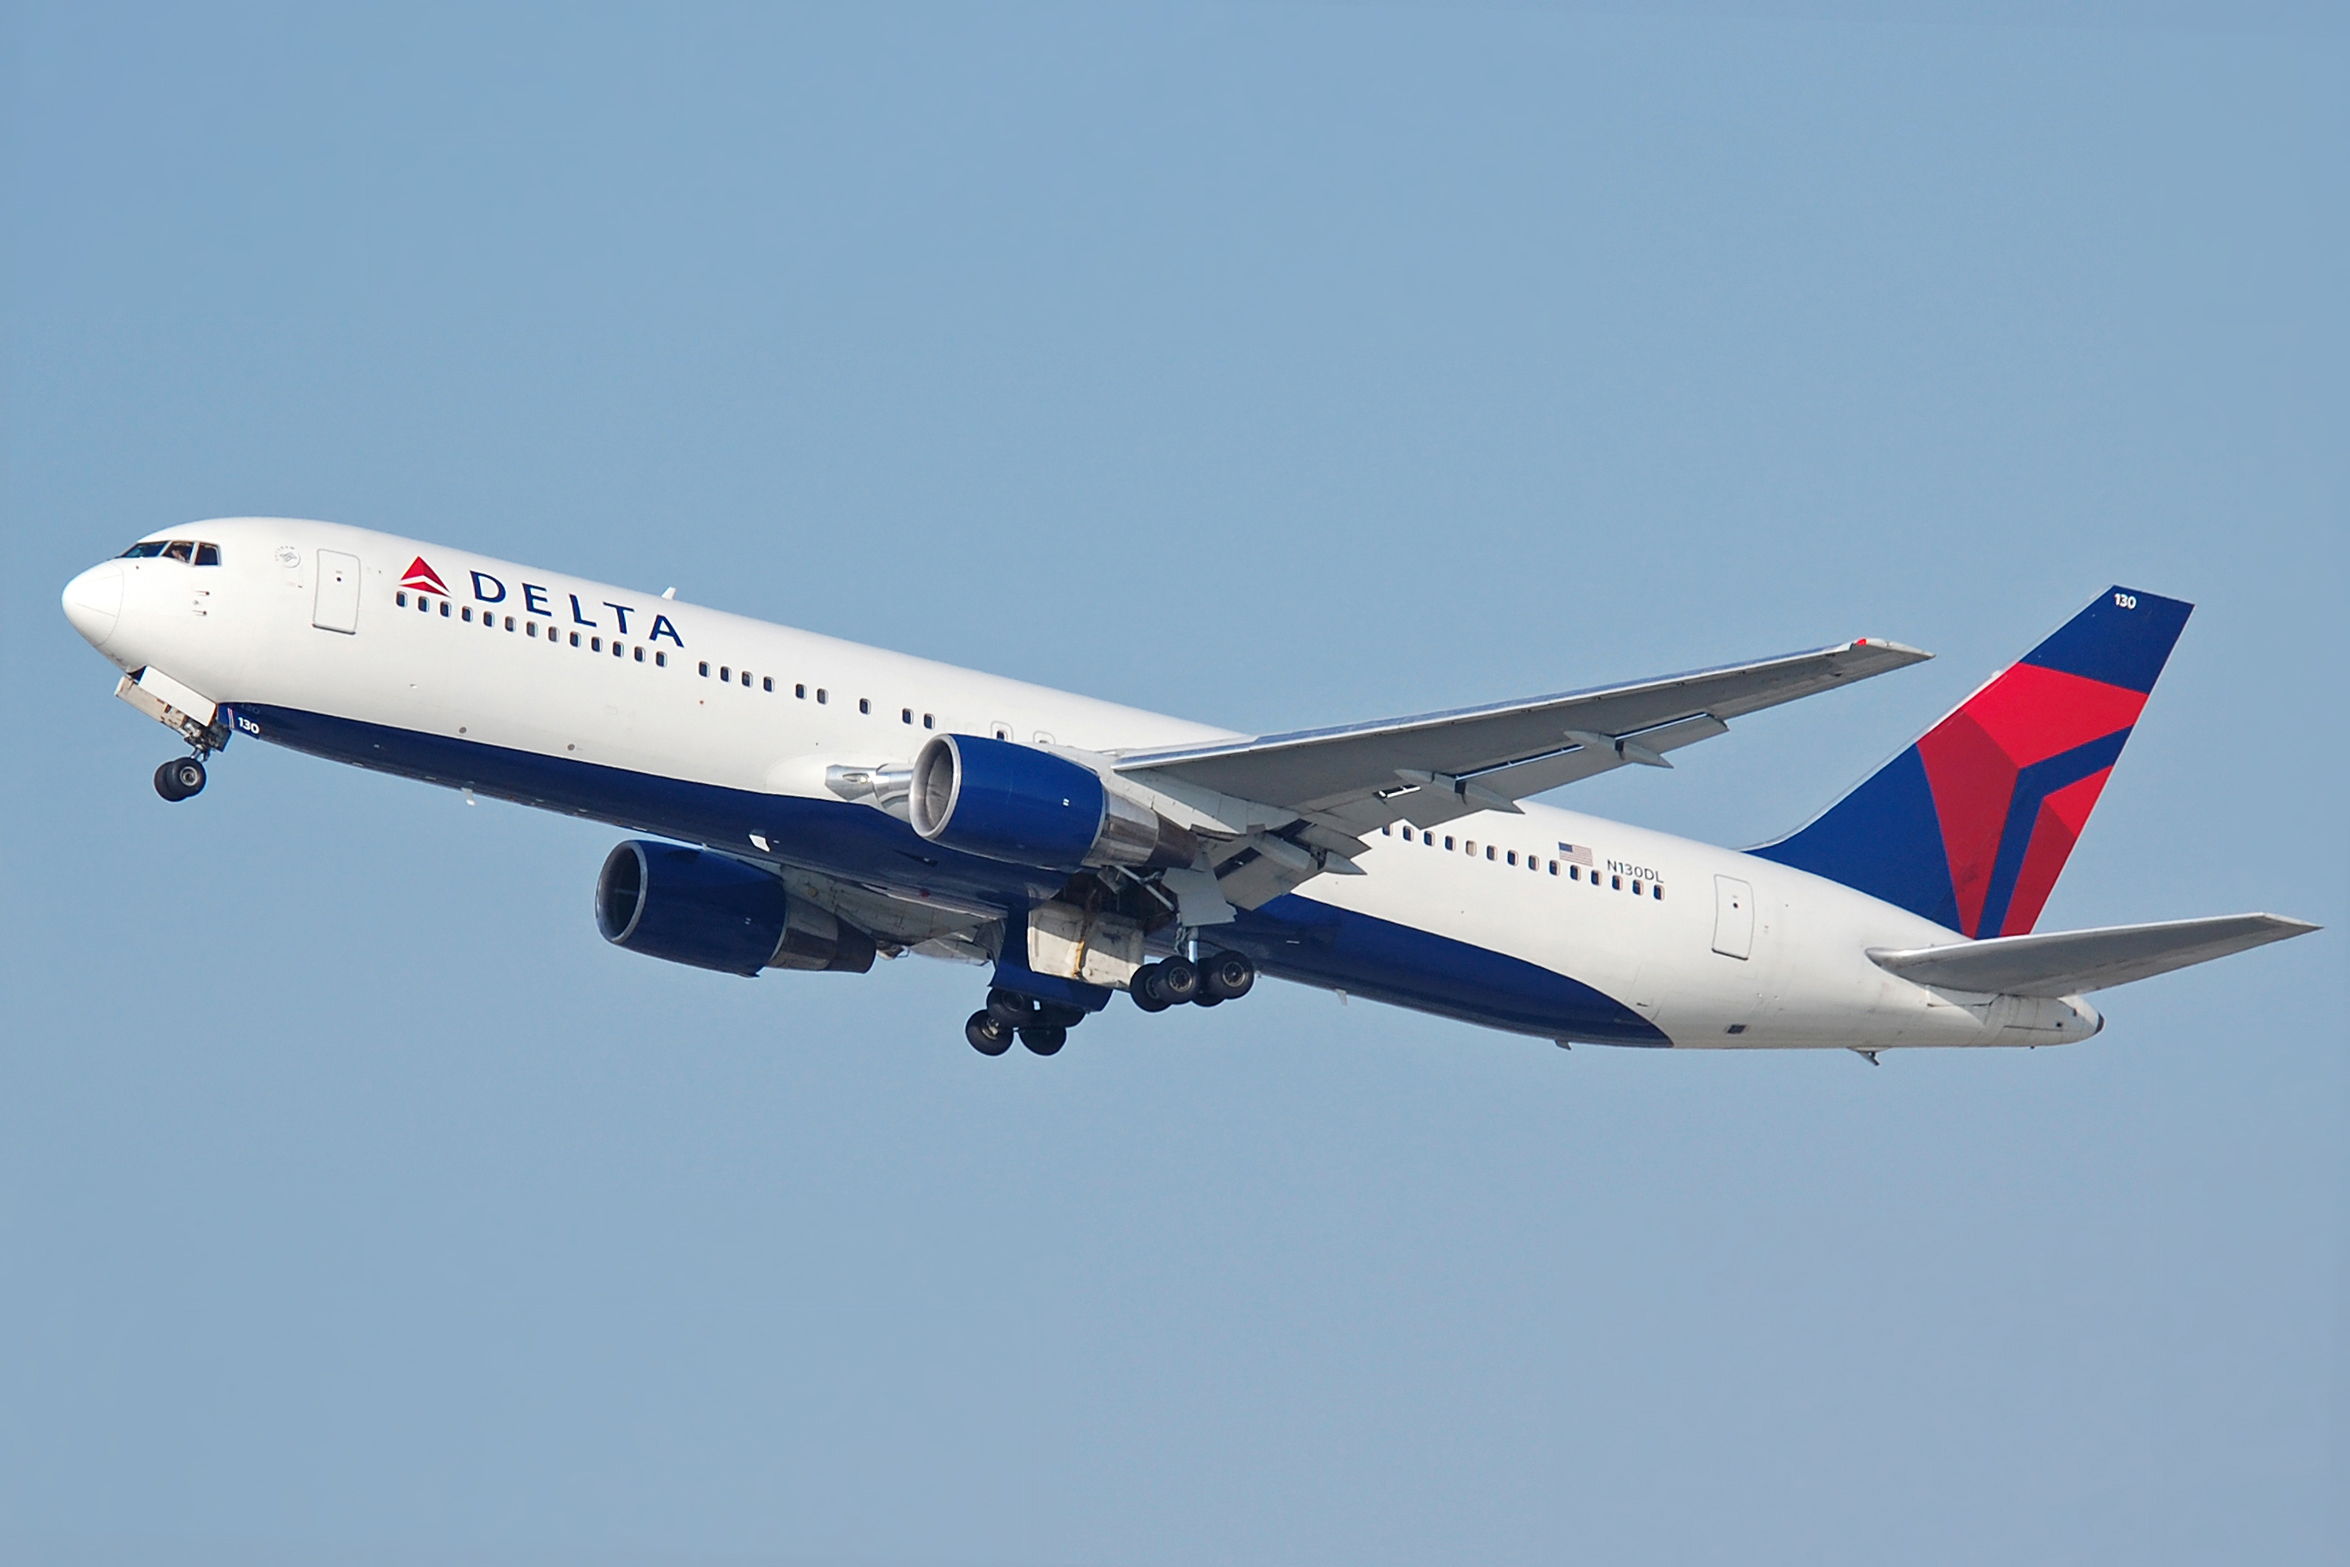 File:Delta Air Lines B767-332 N130DL.jpg - Wikimedia Commons